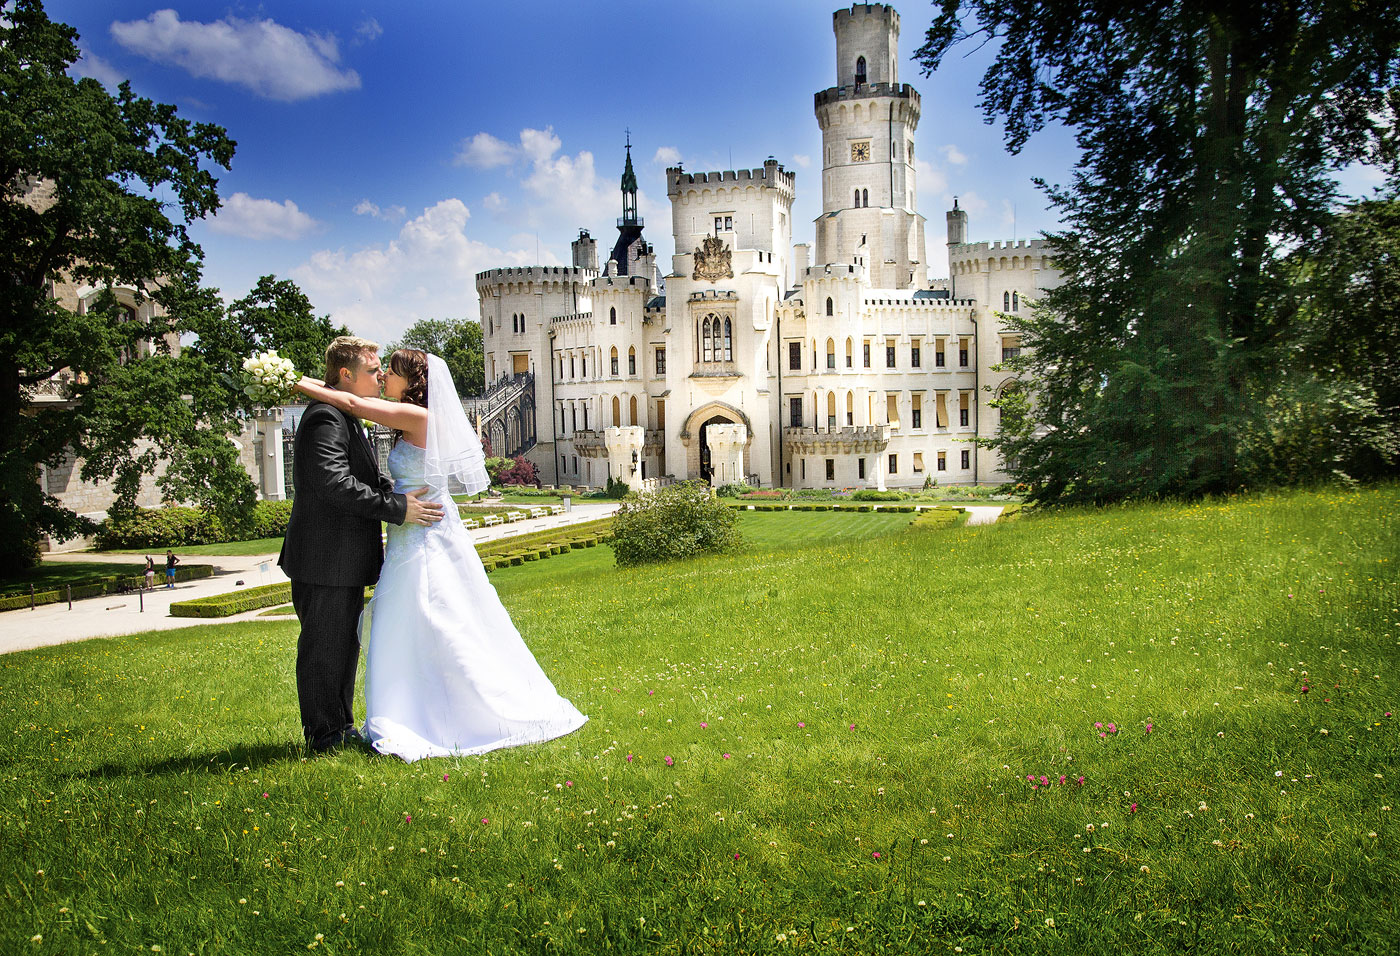 Svatba Hluboká nad Vltavou - svatební fotograf - D.Rataj